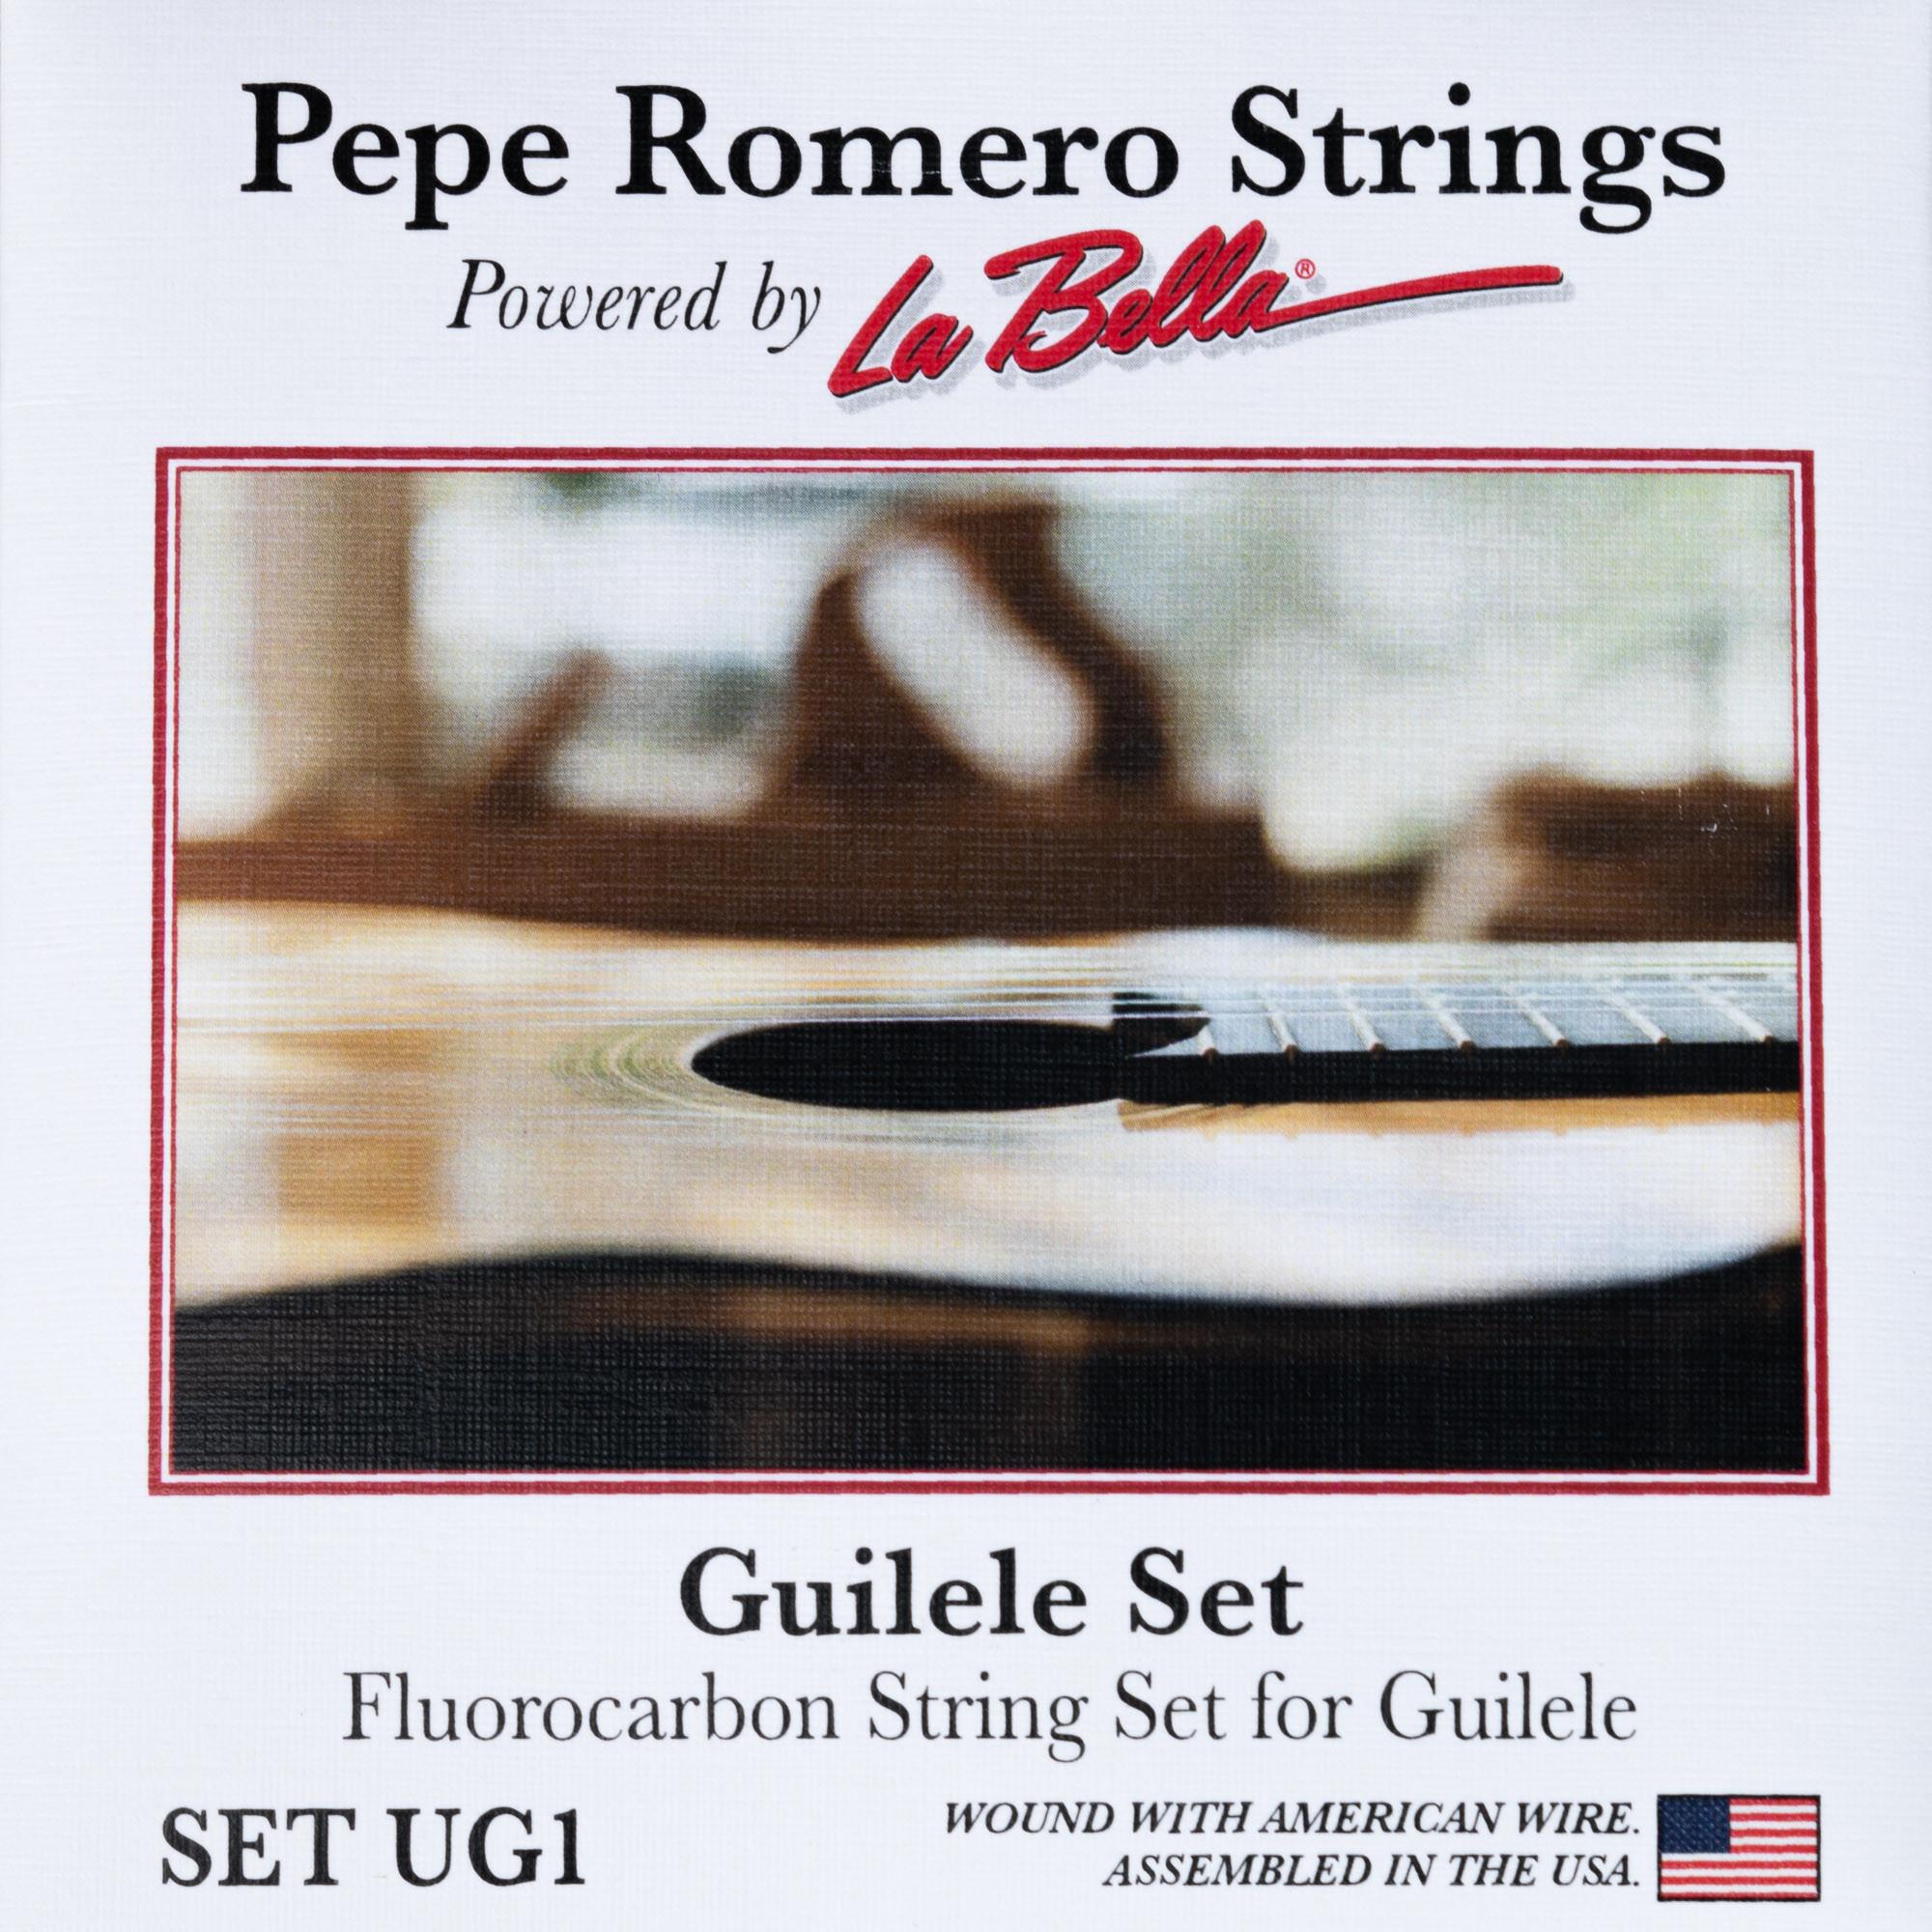 Pepe Romero Strings UG1 Guilele Fluorocarbon